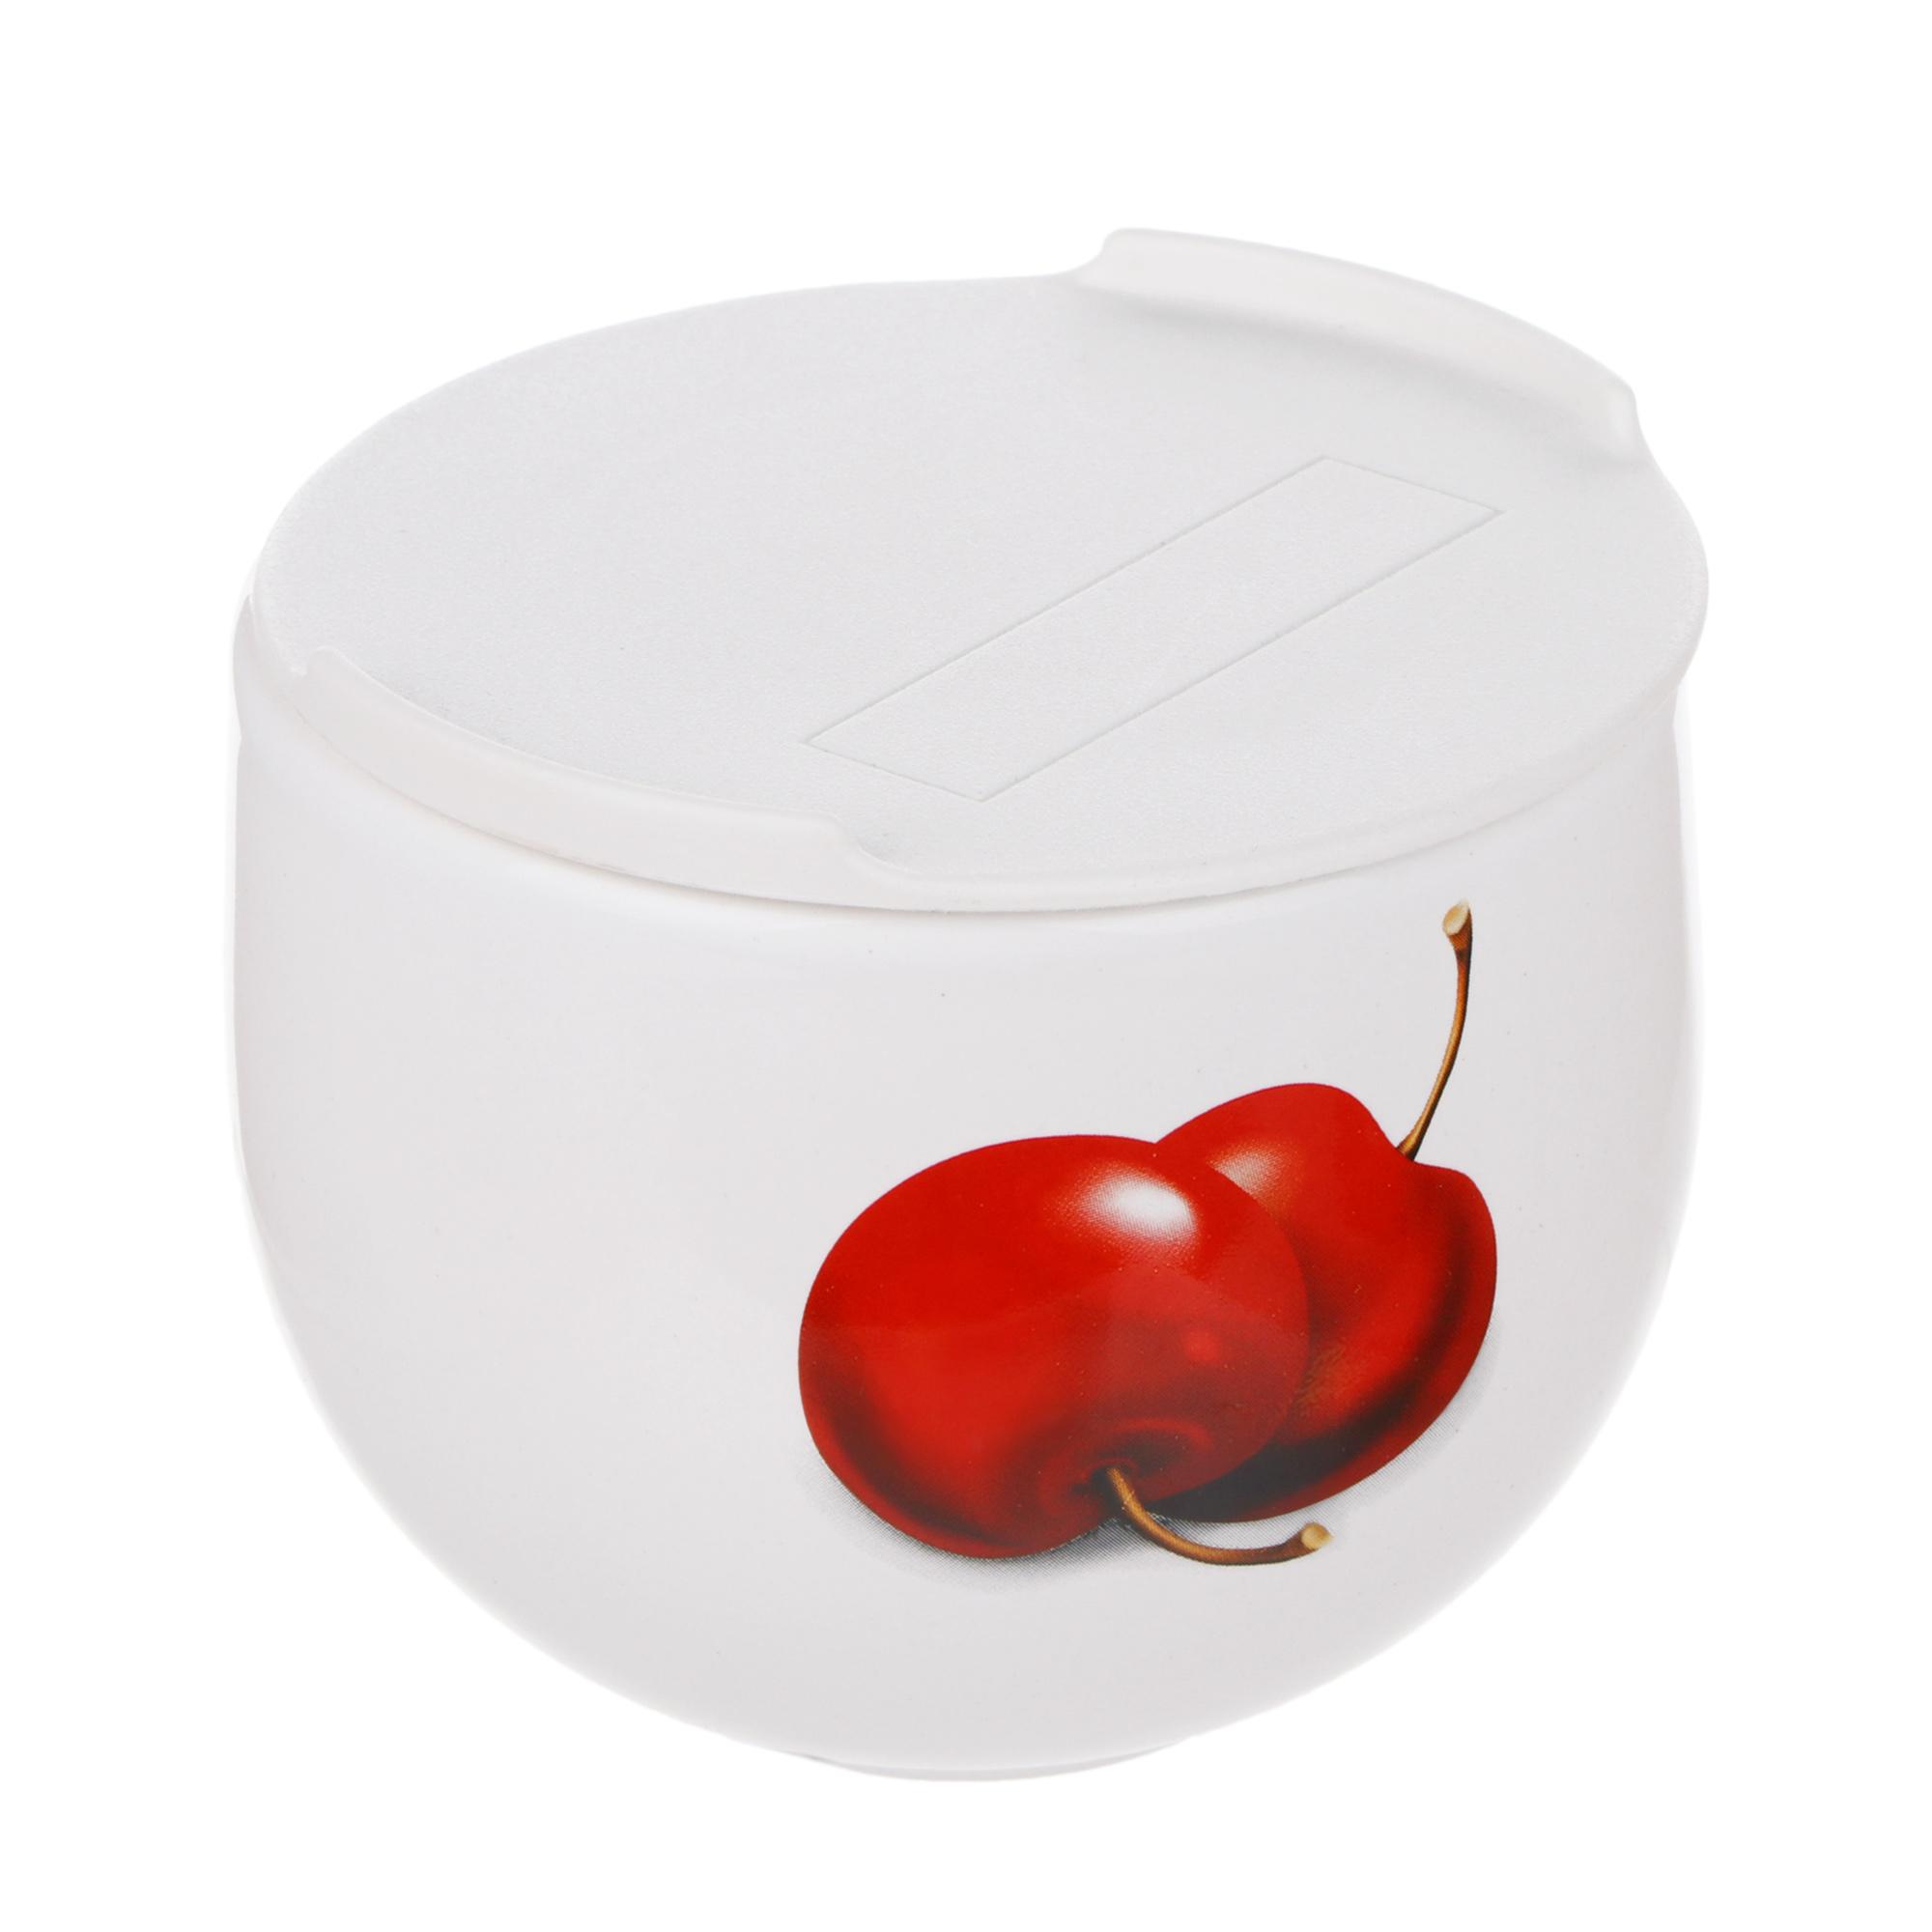 Фото - Банка Asa Selection Grande Вишня 9,5х8 см банка asa selection grande томаты 9 5х8 см